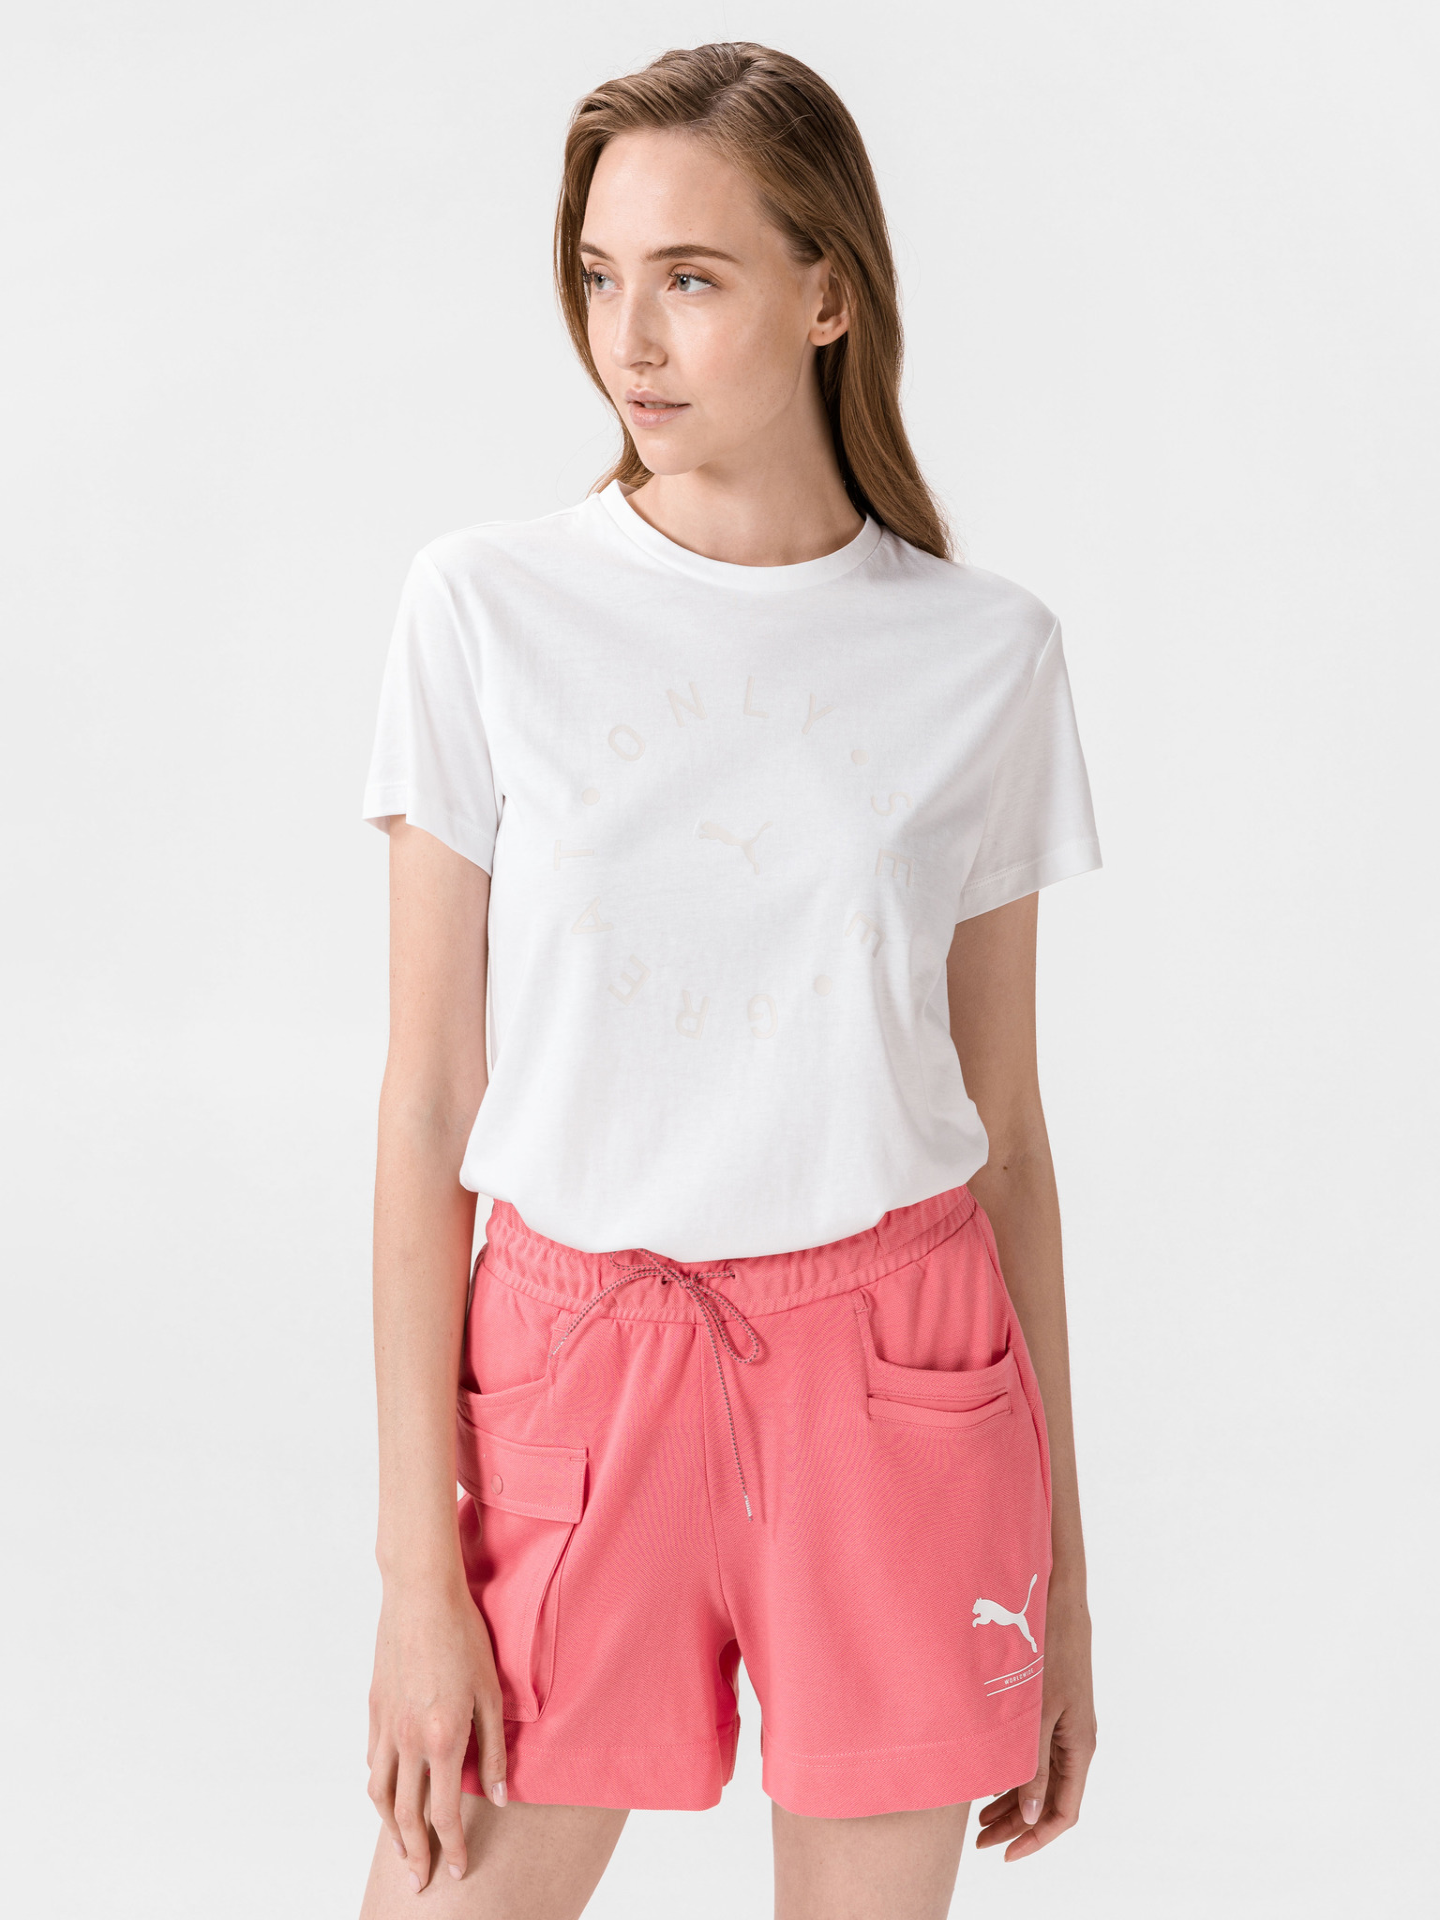 Puma biały damska koszulka